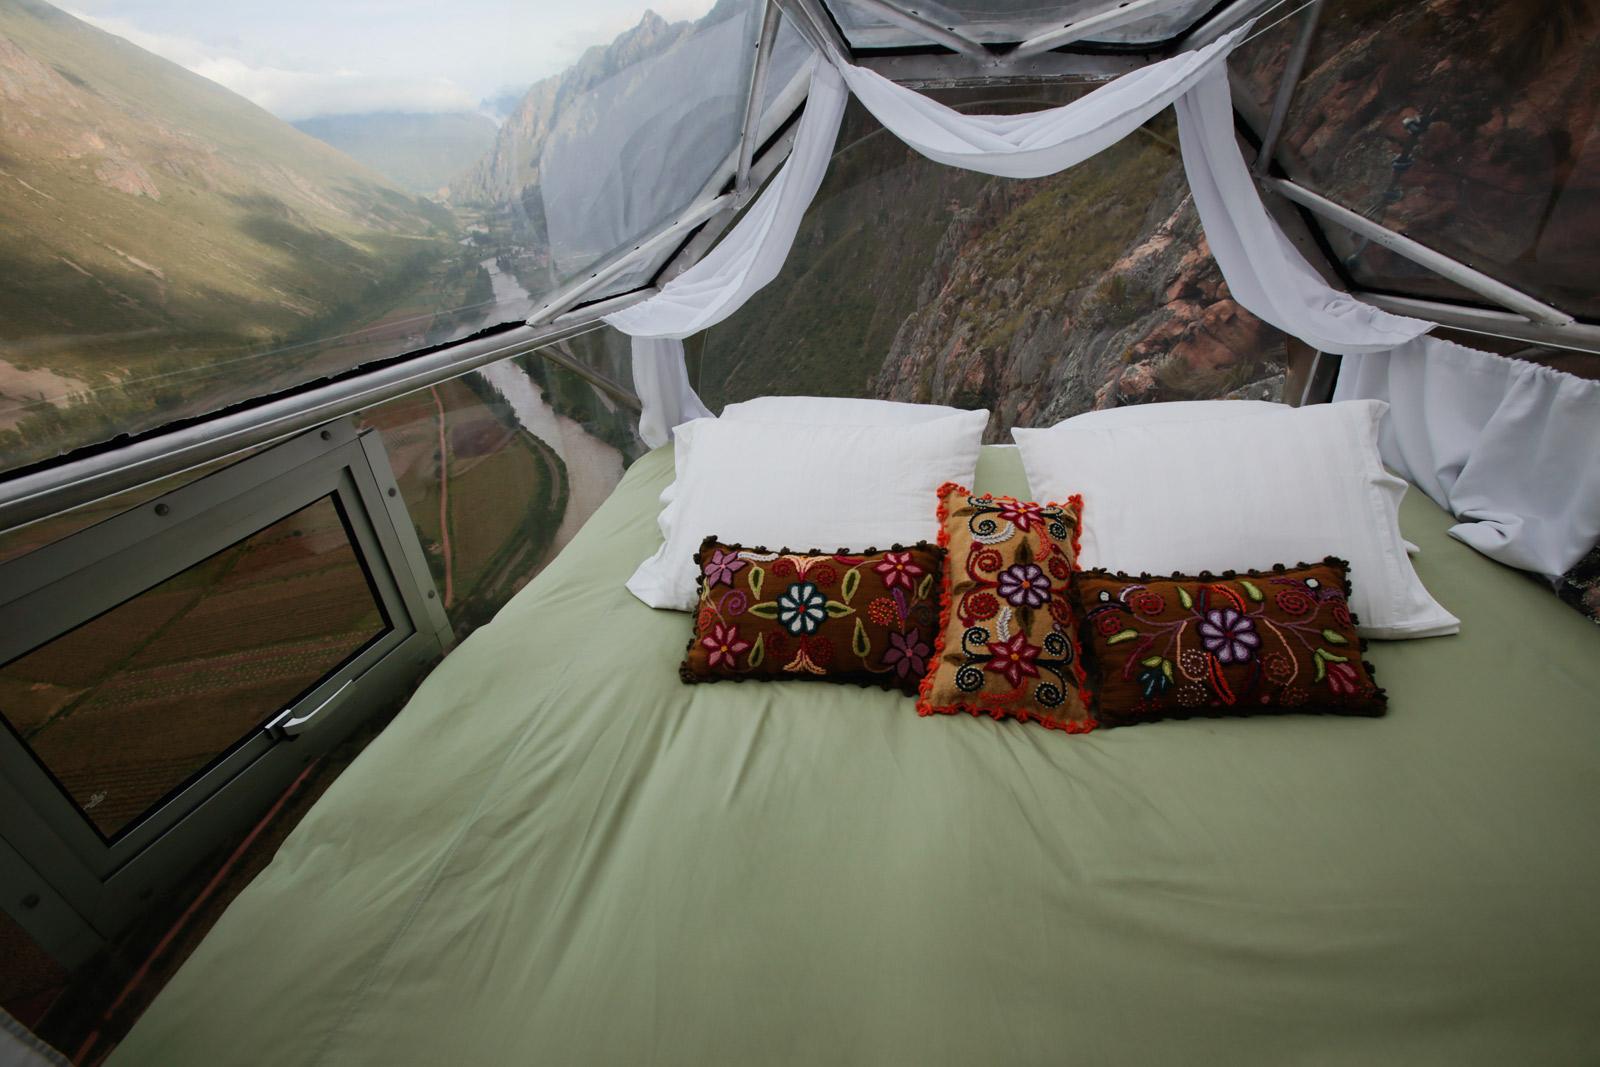 skylodge bed